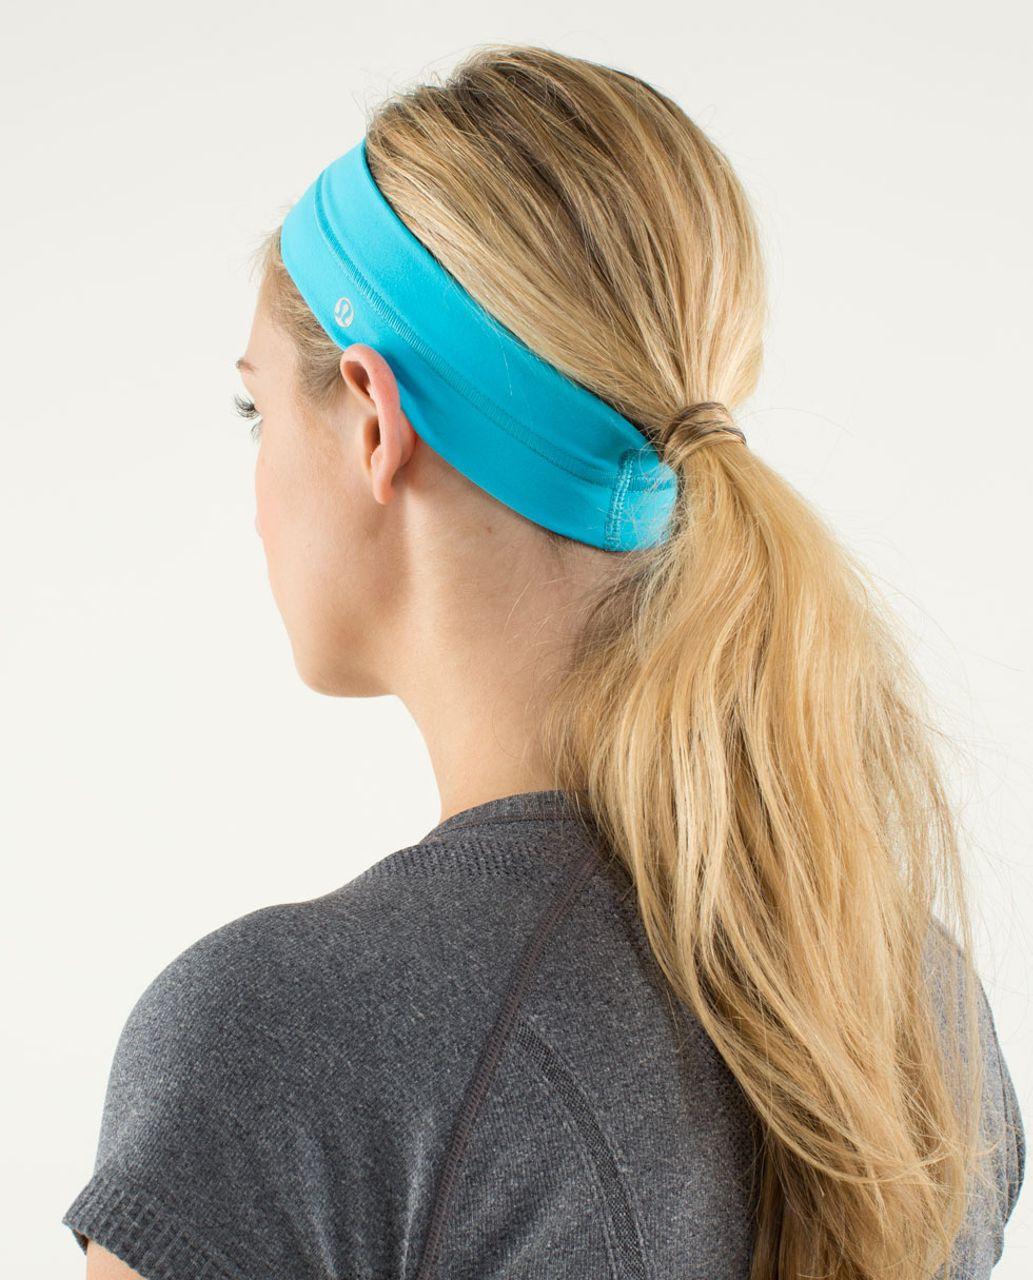 Lululemon Fly Away Tamer Headband - Spry Blue